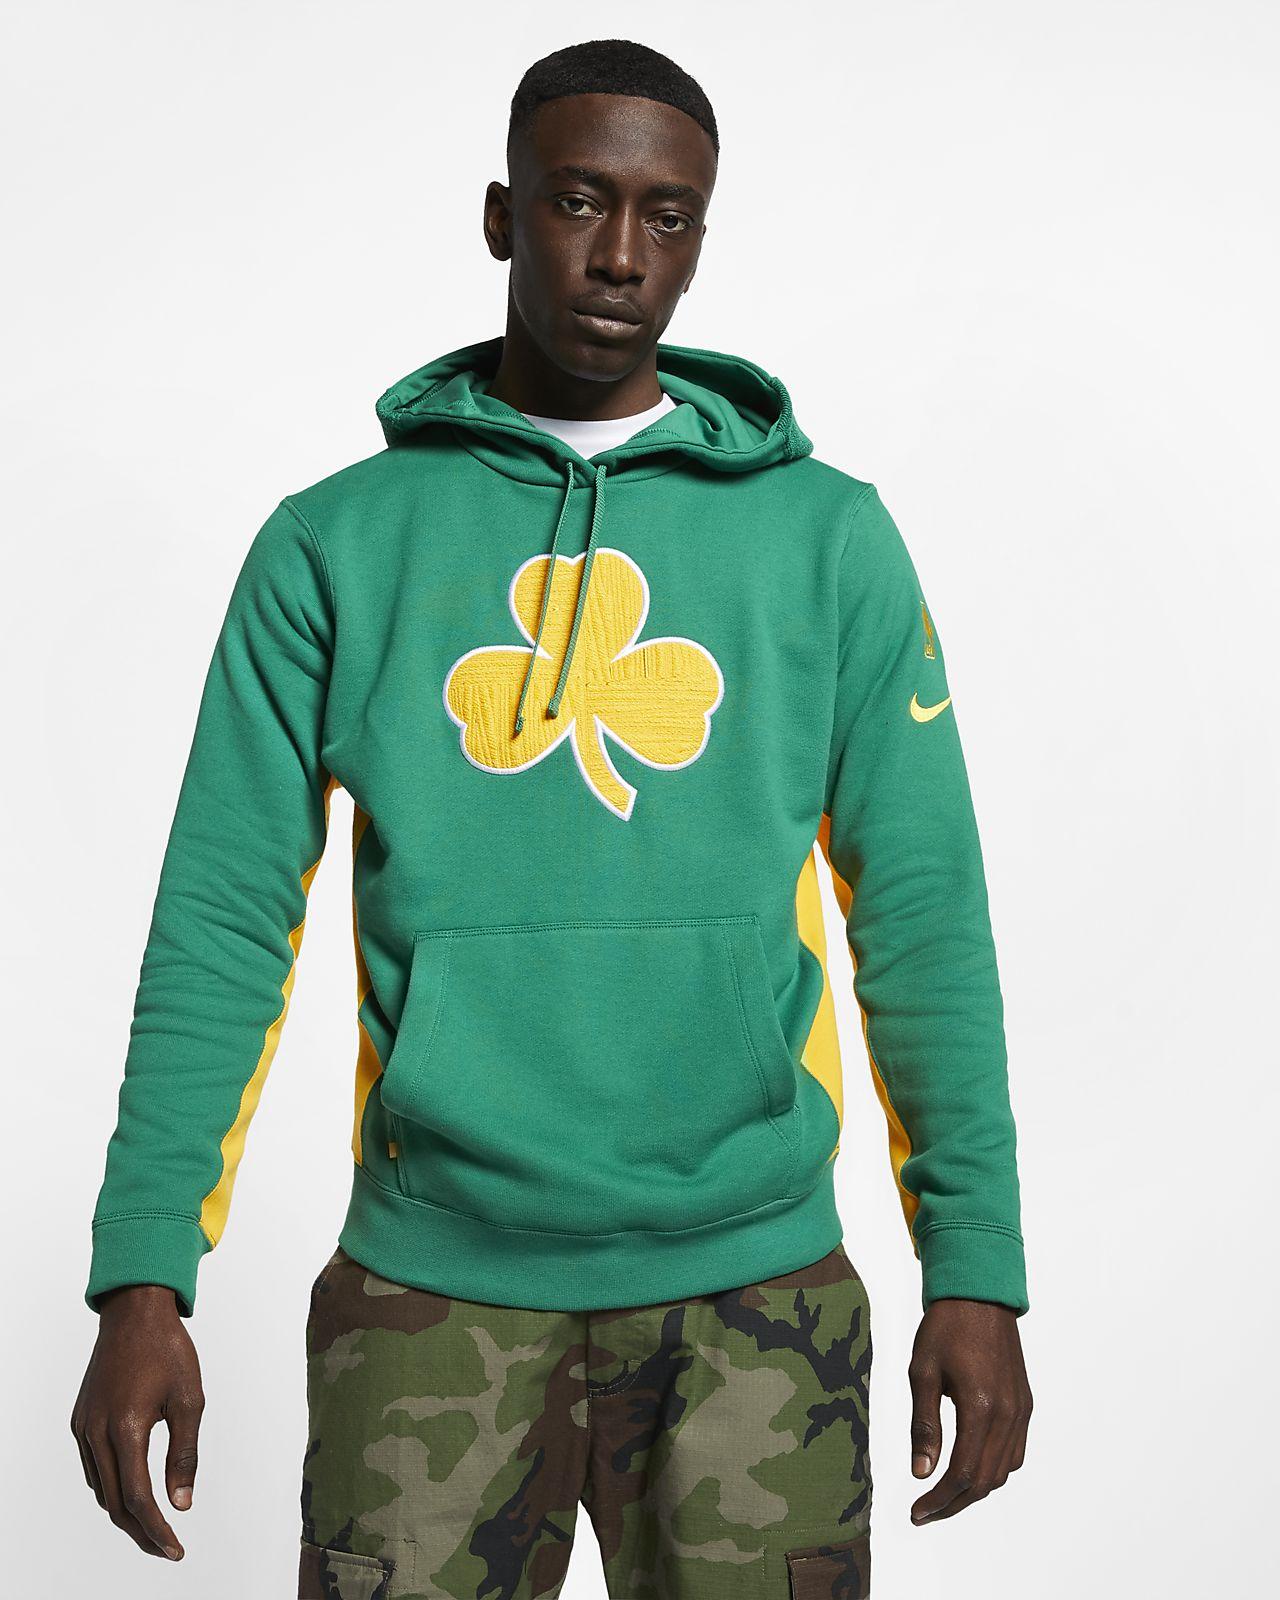 Sudadera con capucha de la NBA para hombre Boston Celtics Nike